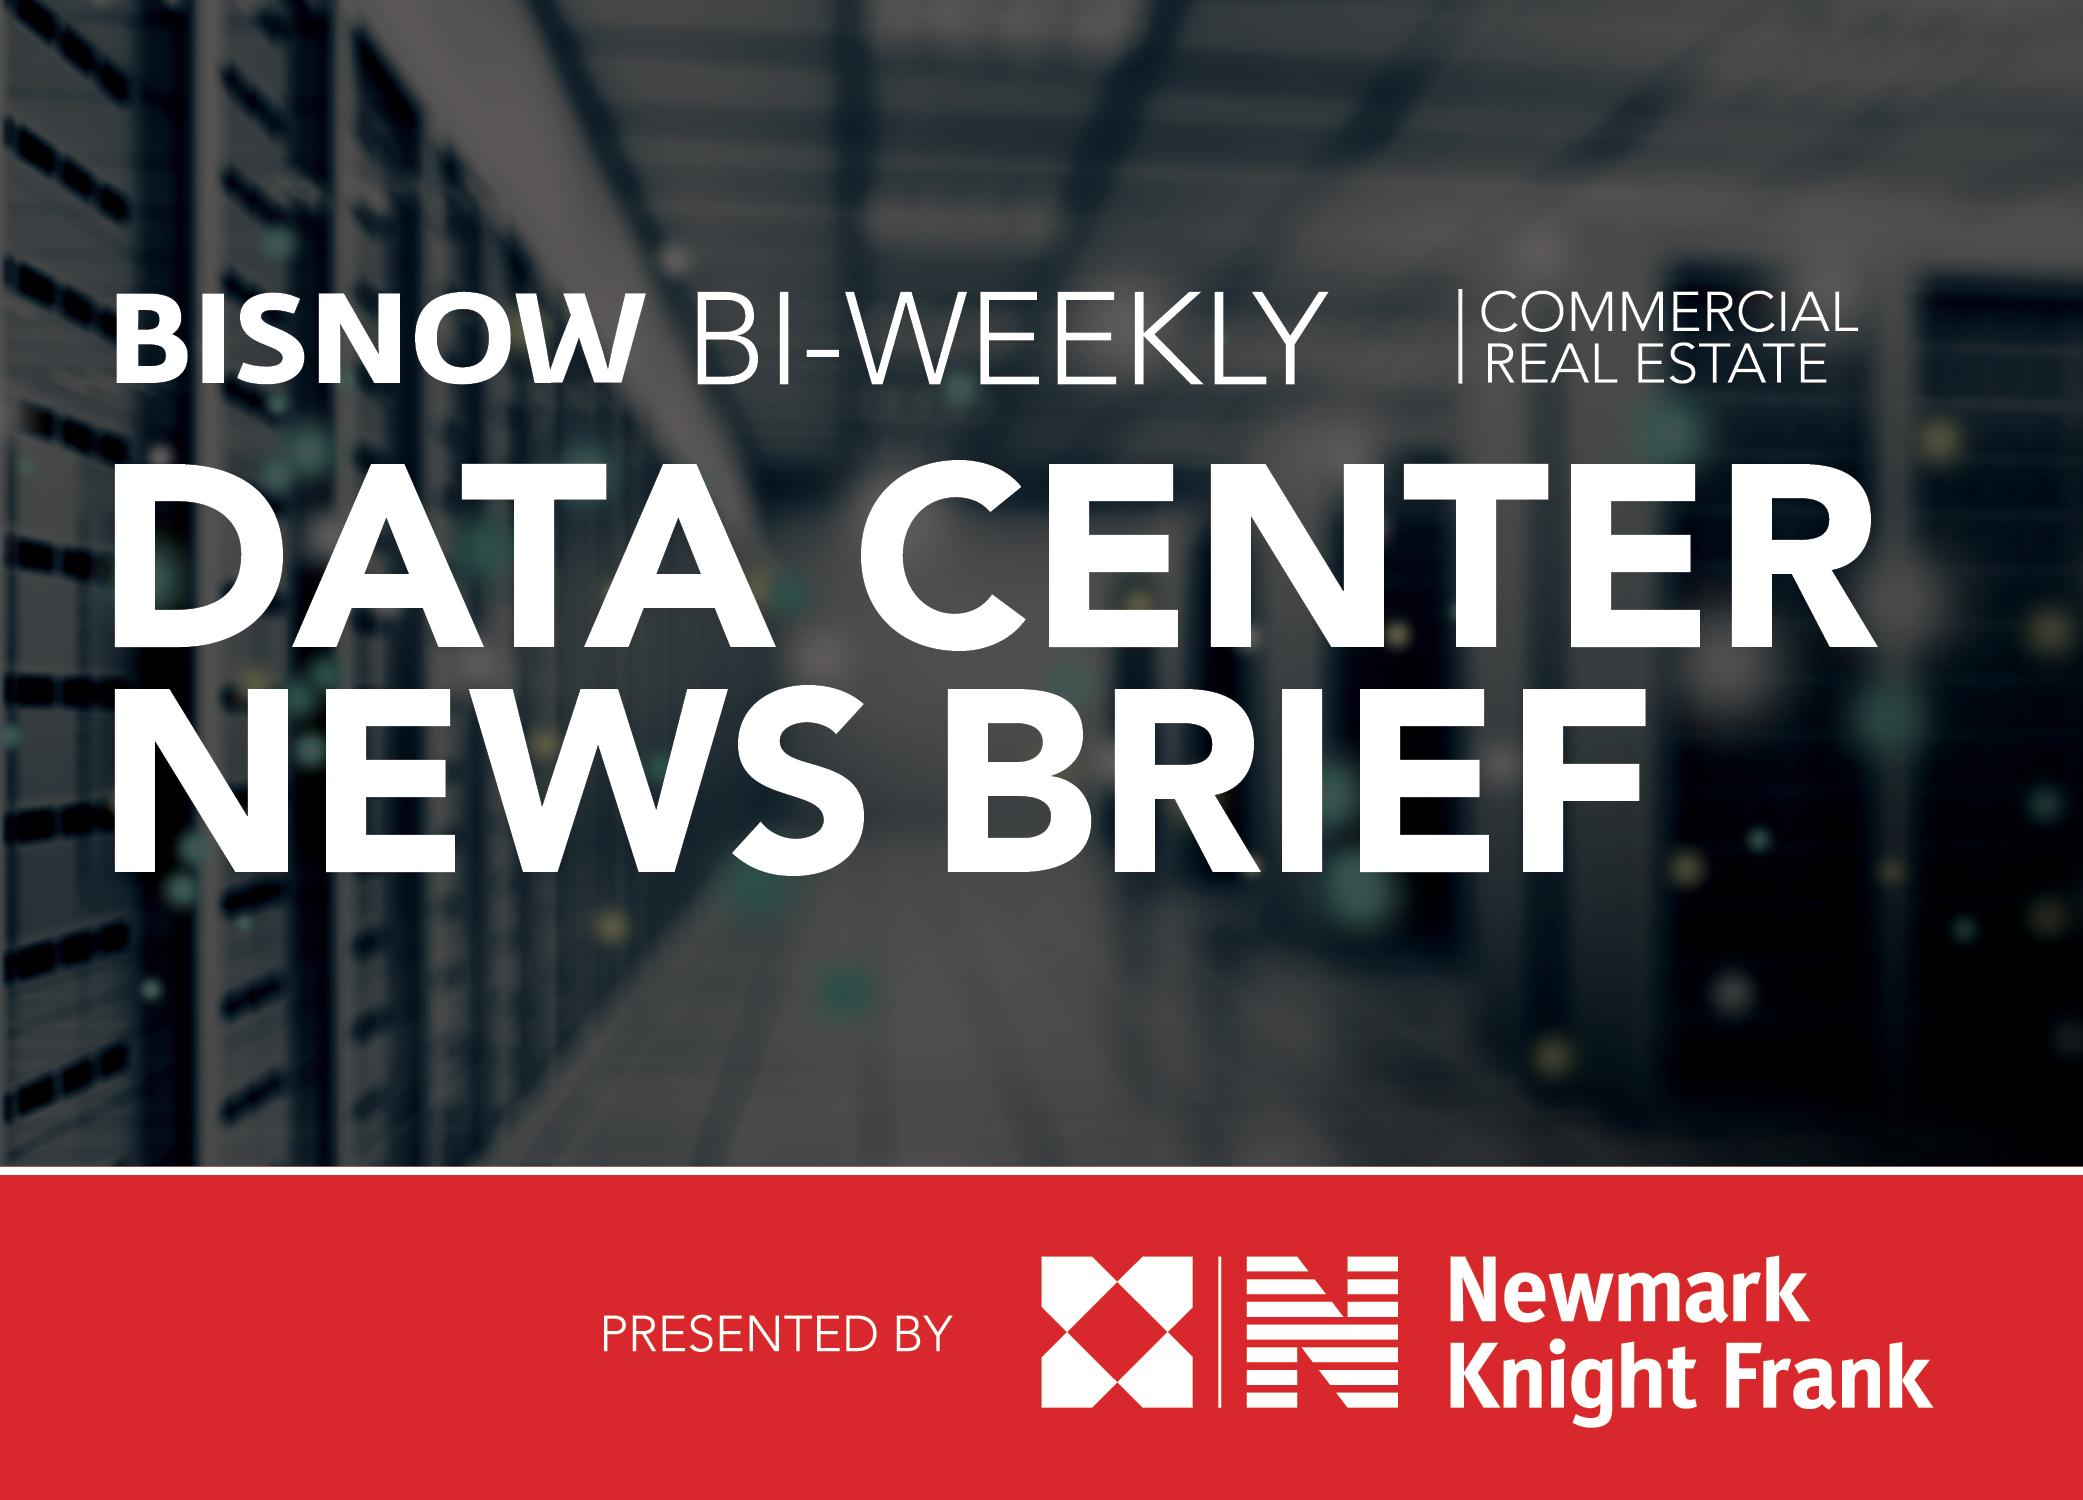 Bisnow Morning Brief Data Center WEEKLY BRIEF [National]